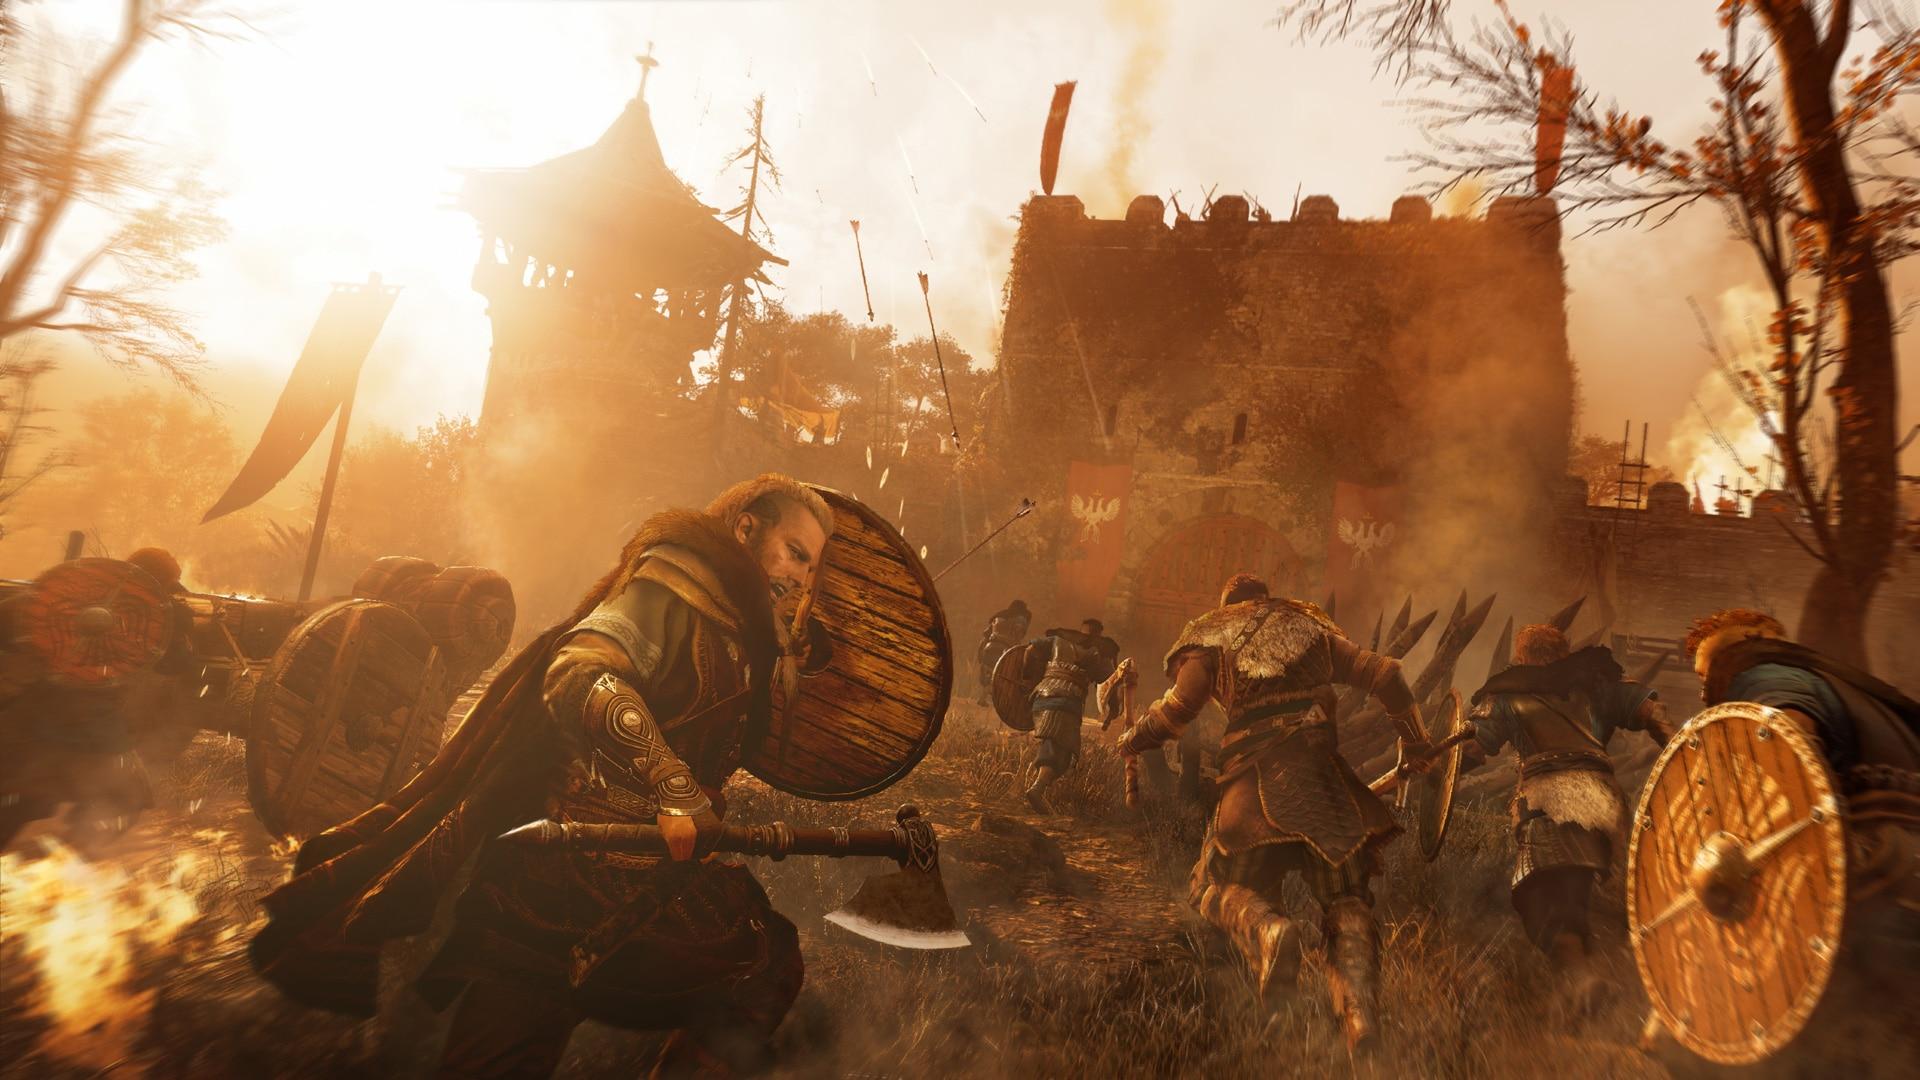 Assassin's Creed Valhalla – Assault Castles, Repair Broken Kingdoms, and Recruit a Cat Raider on November 17 - Image 3